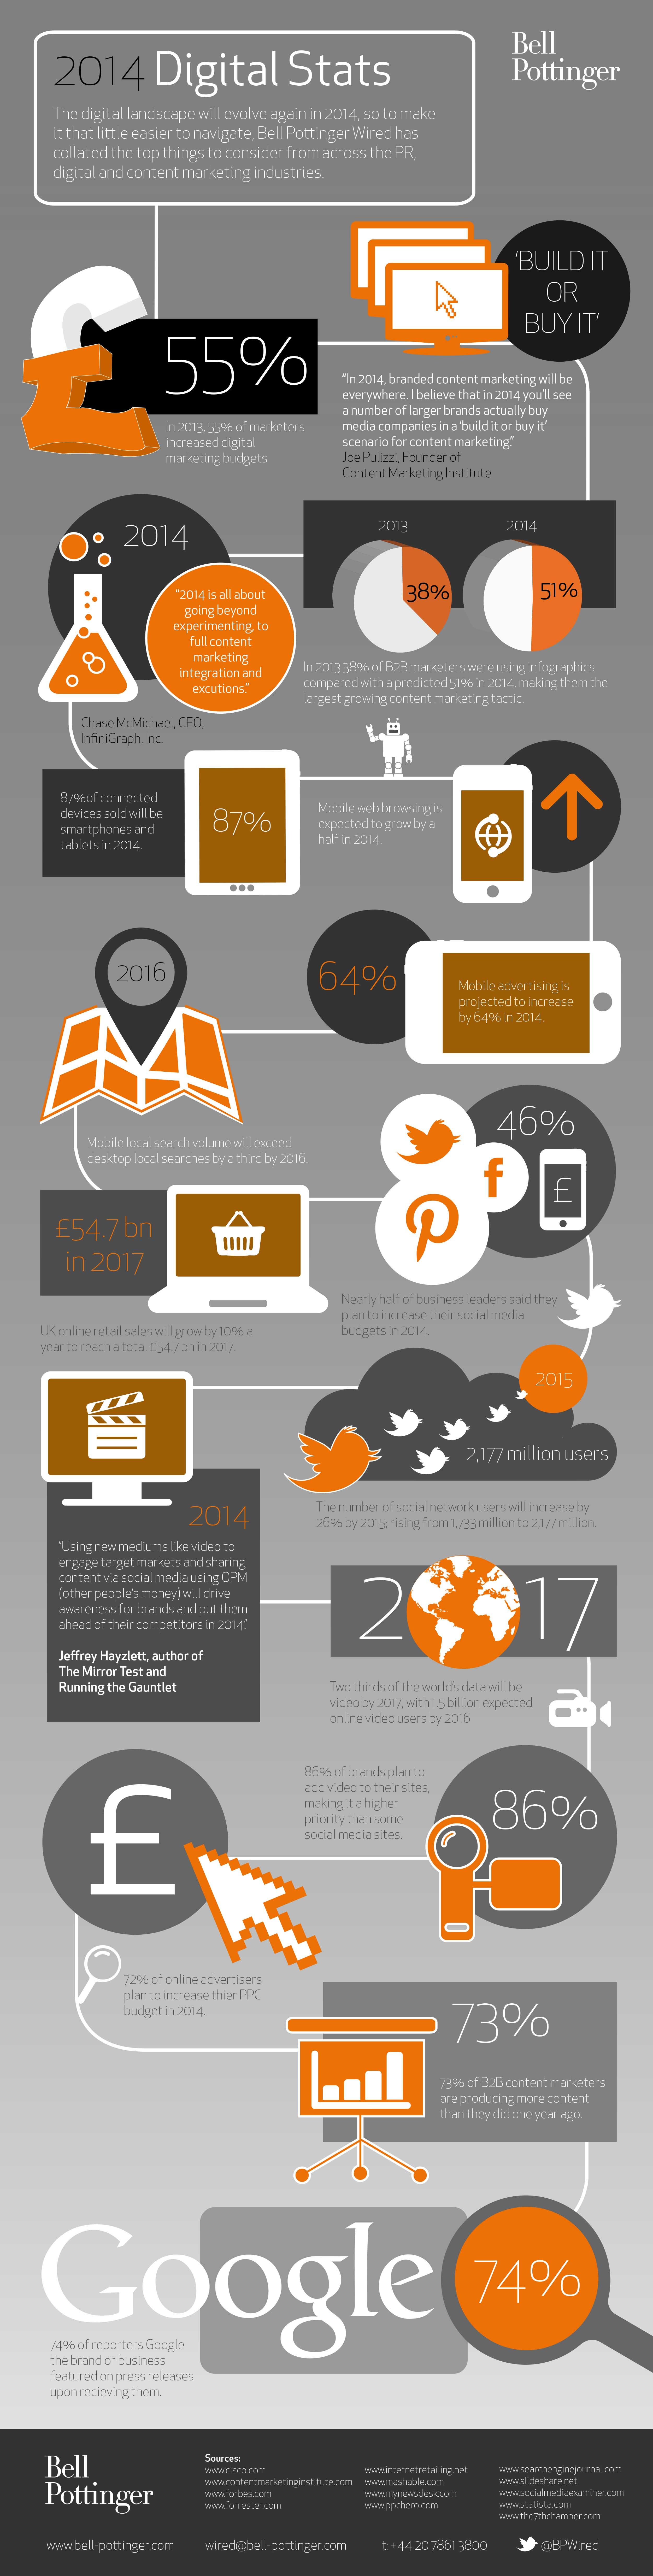 digital marketing statistics 2014 infographic